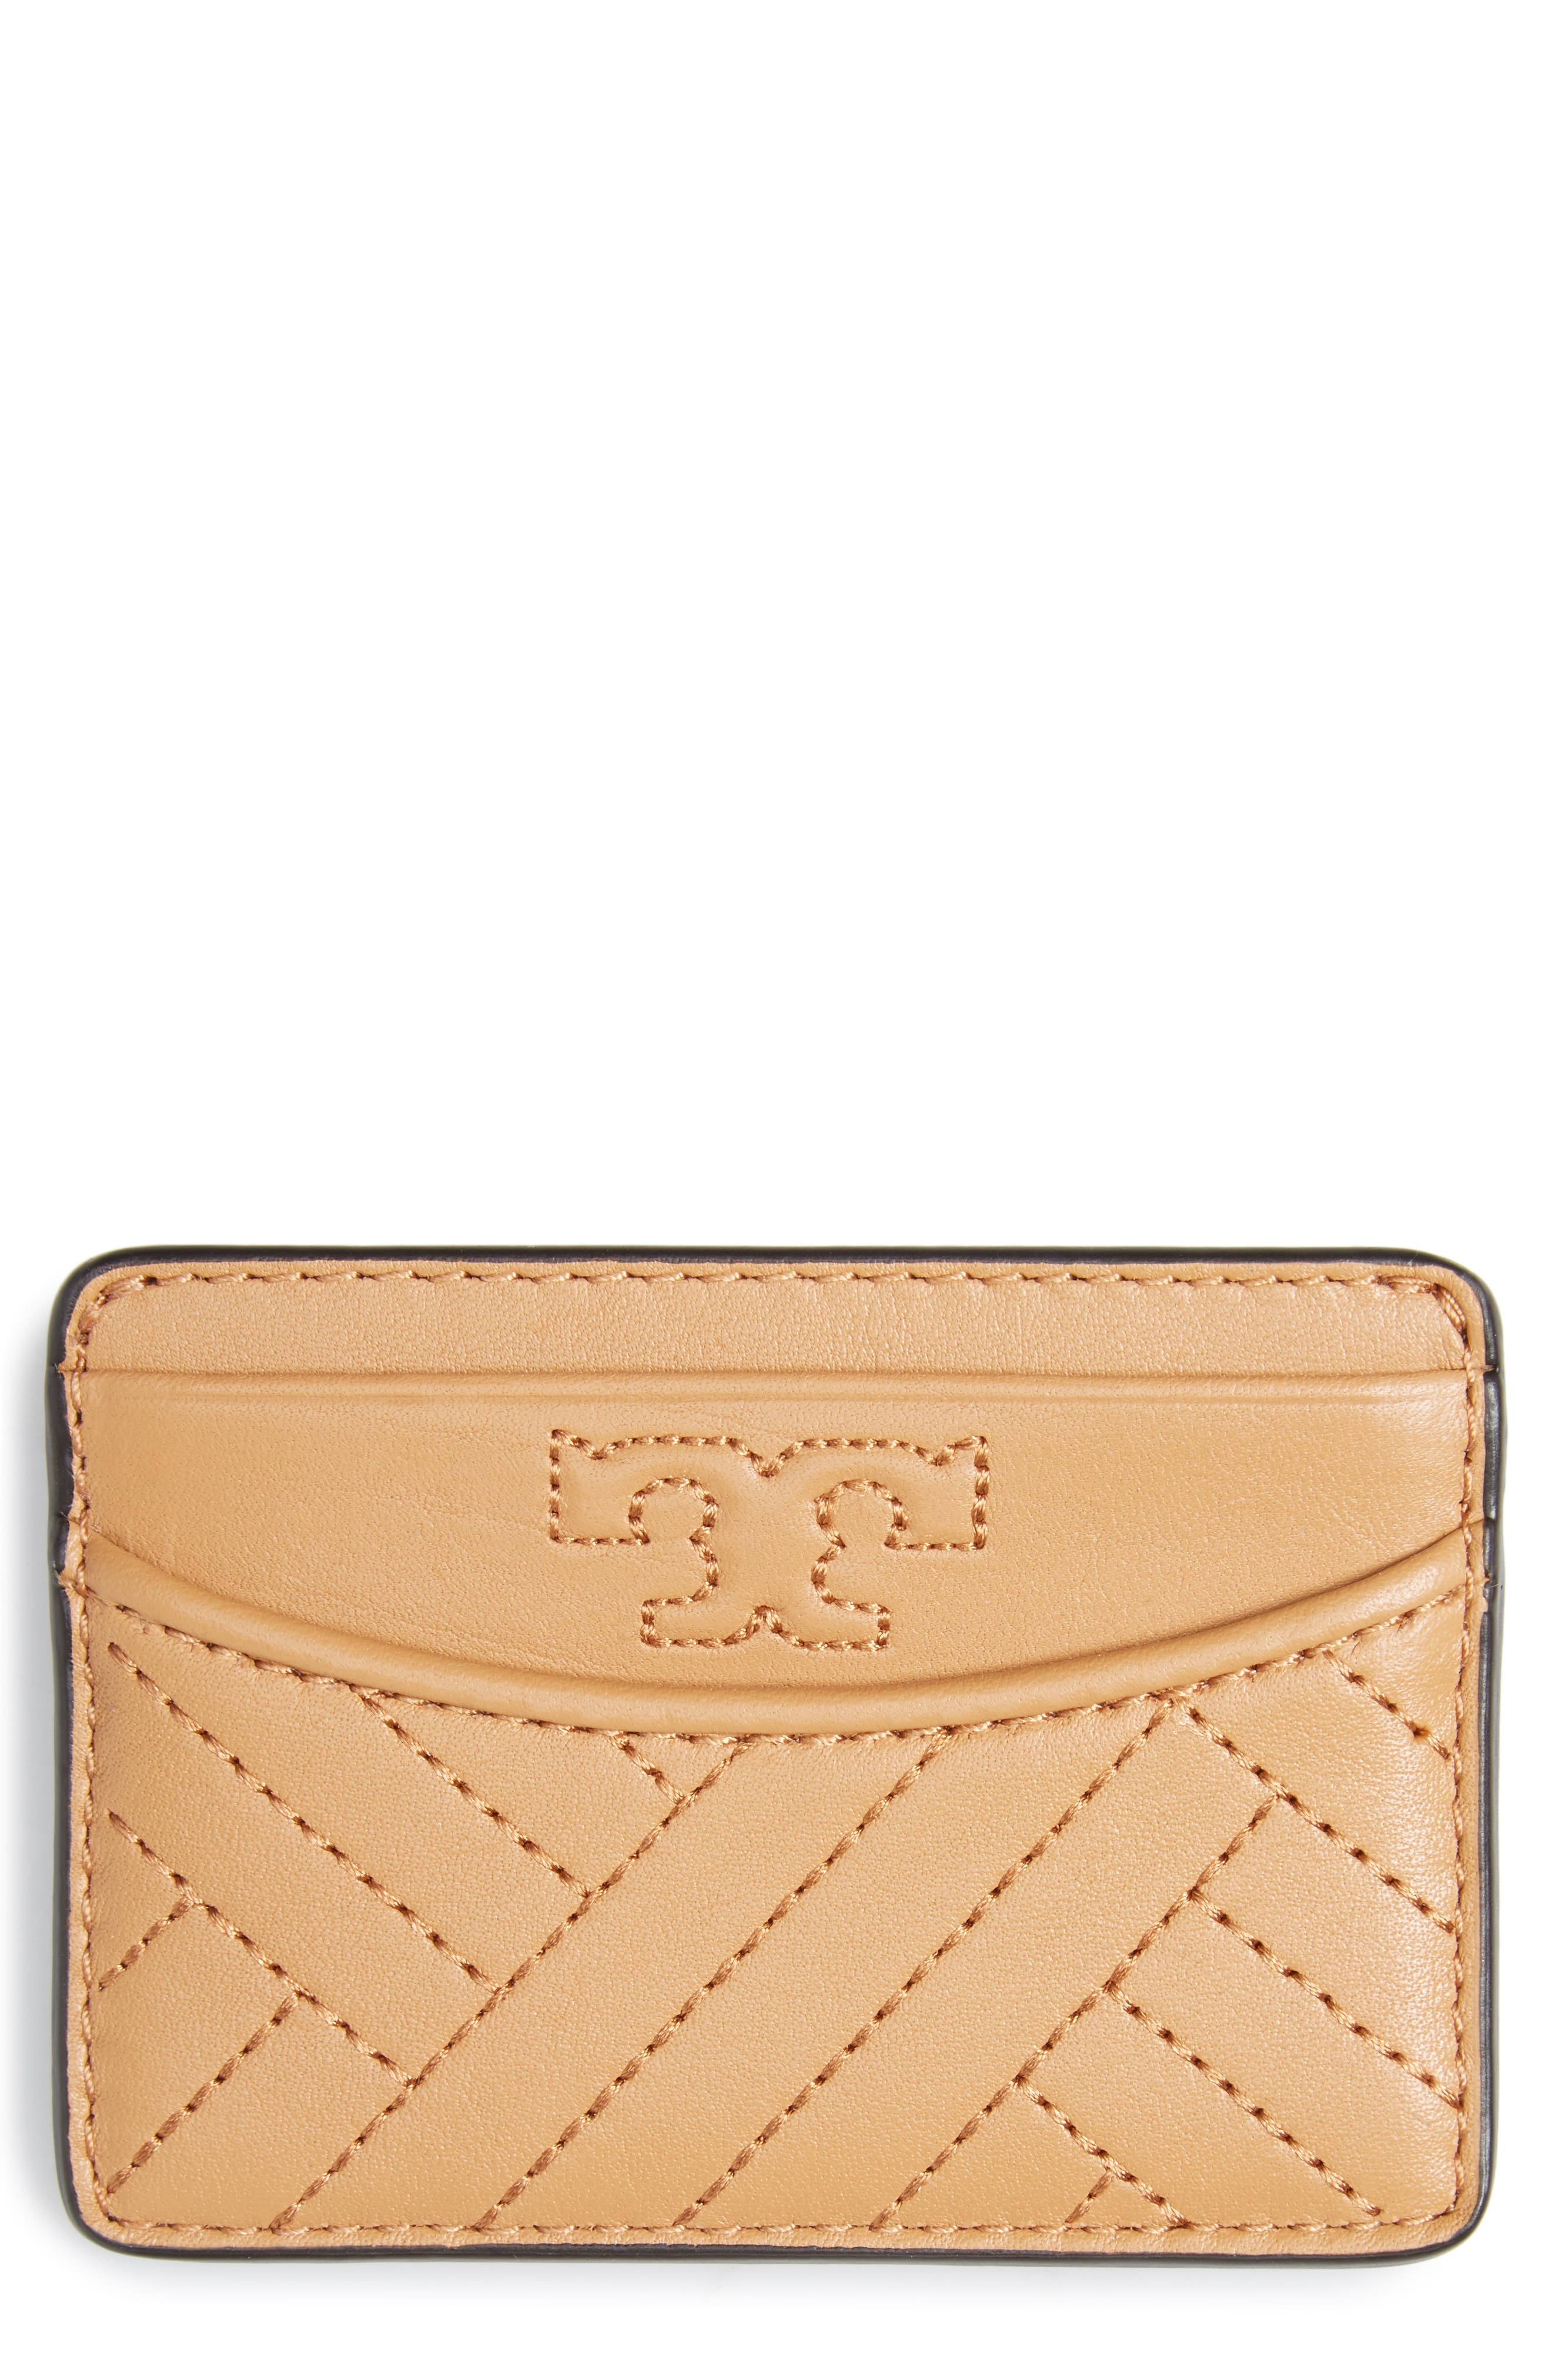 TORY BURCH Alexa Slim Leather Card Case